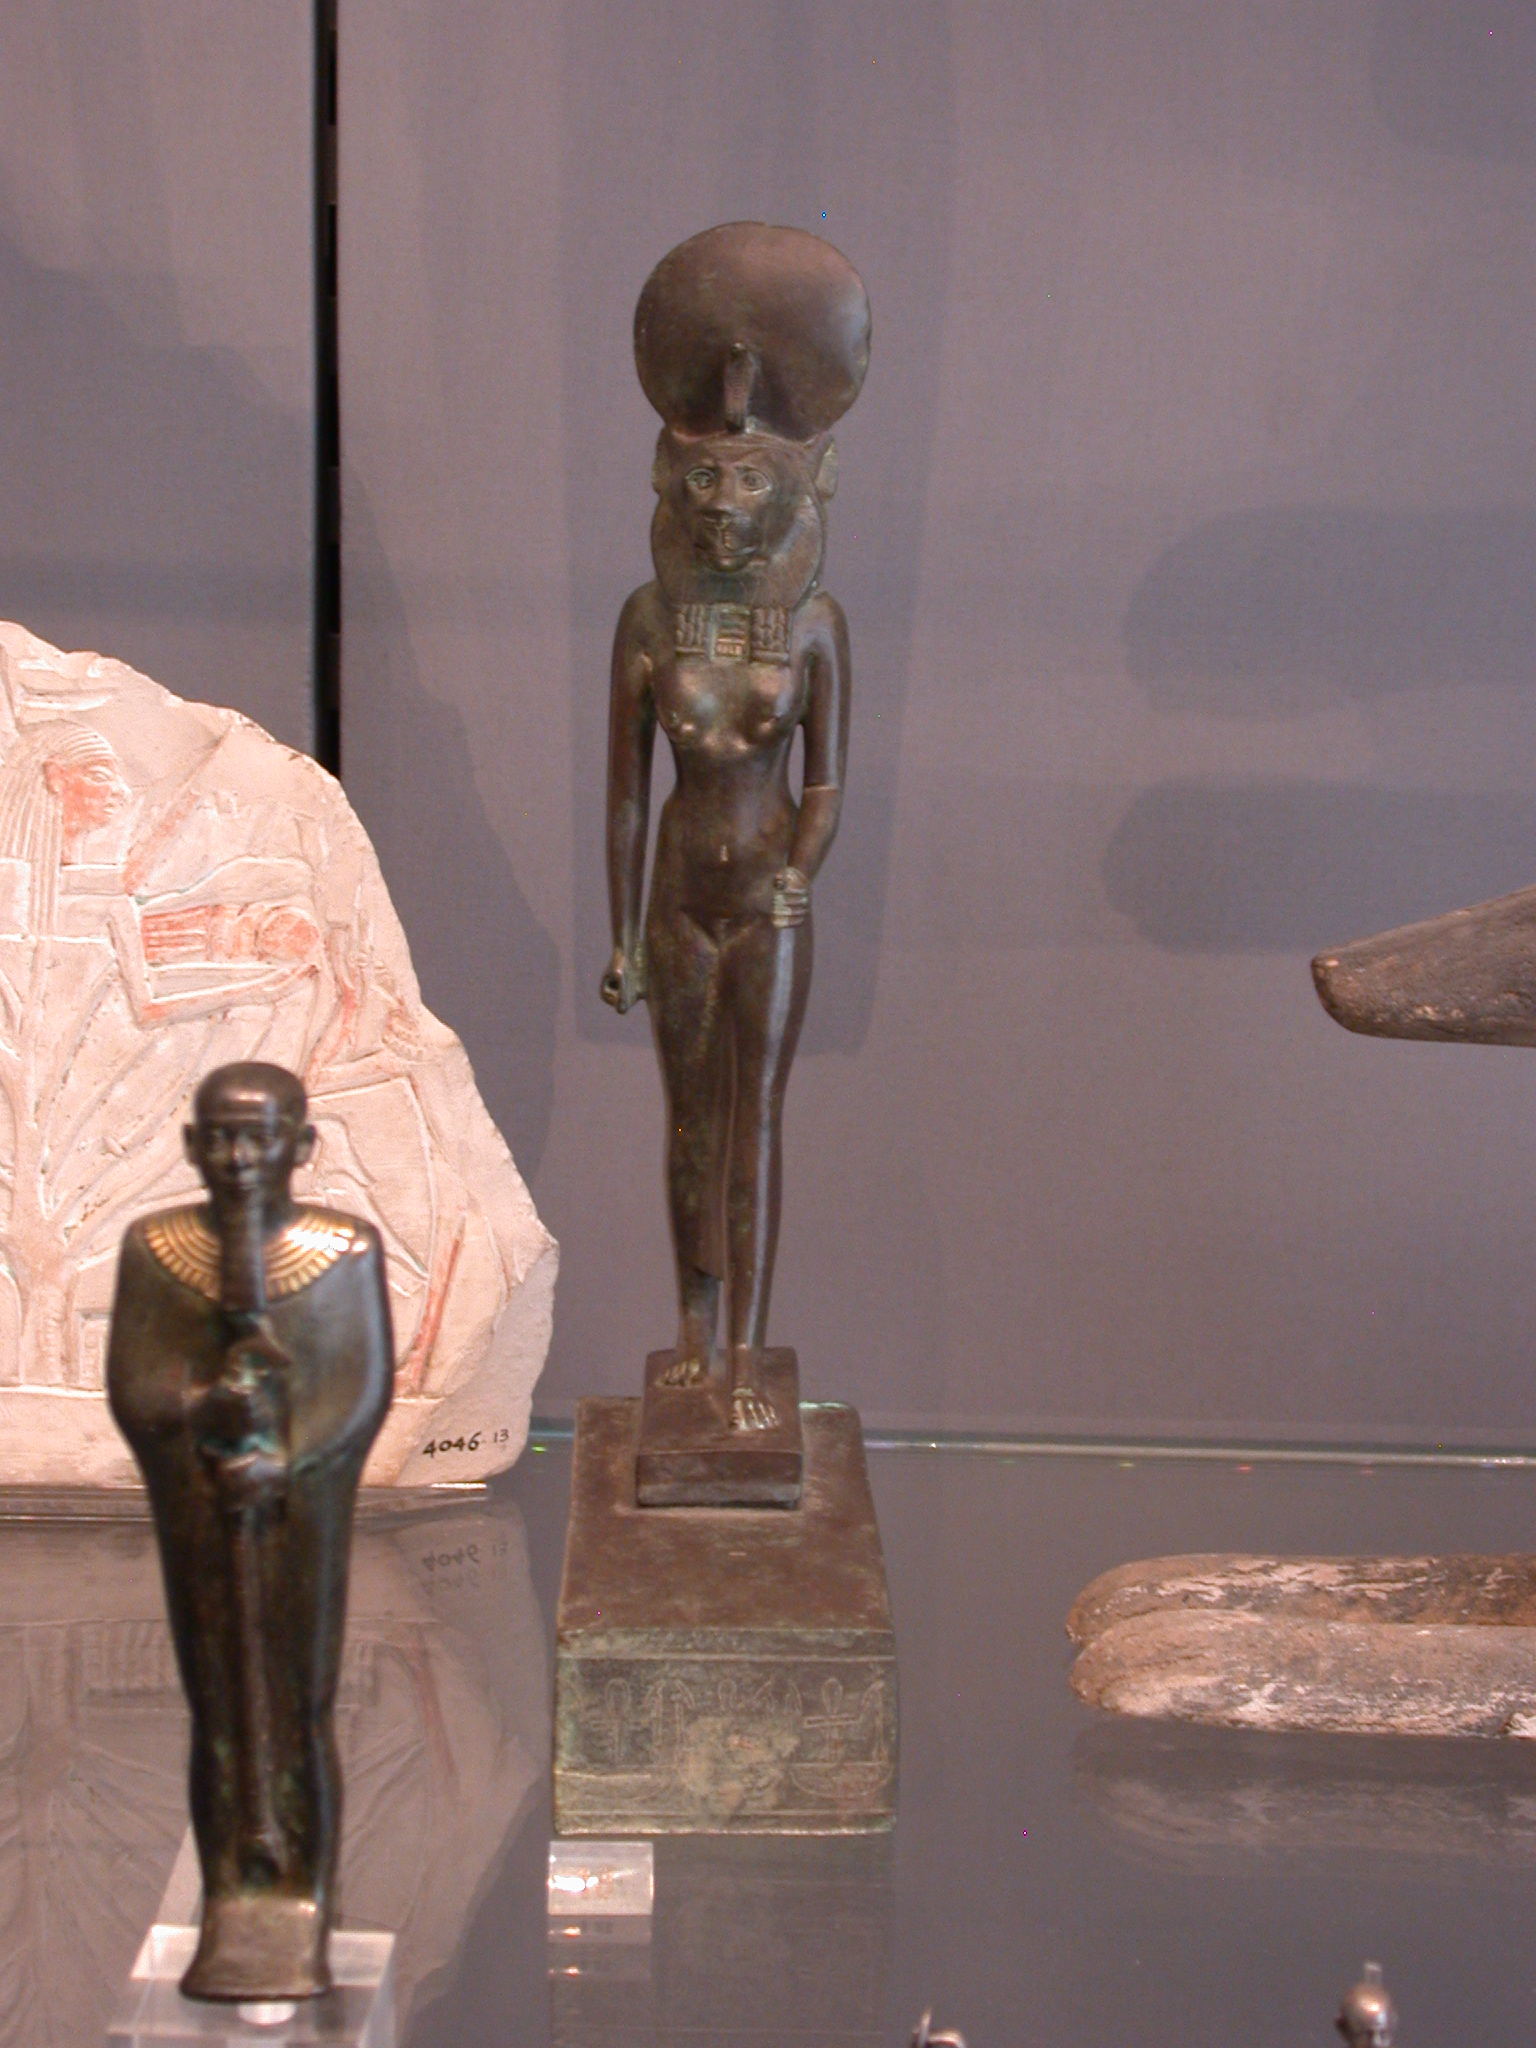 Sekhmet Figure, Copper Alloy, Late Period, 746-336 BCE, Egypt, in Fitzwilliam Museum, Cambridge, England